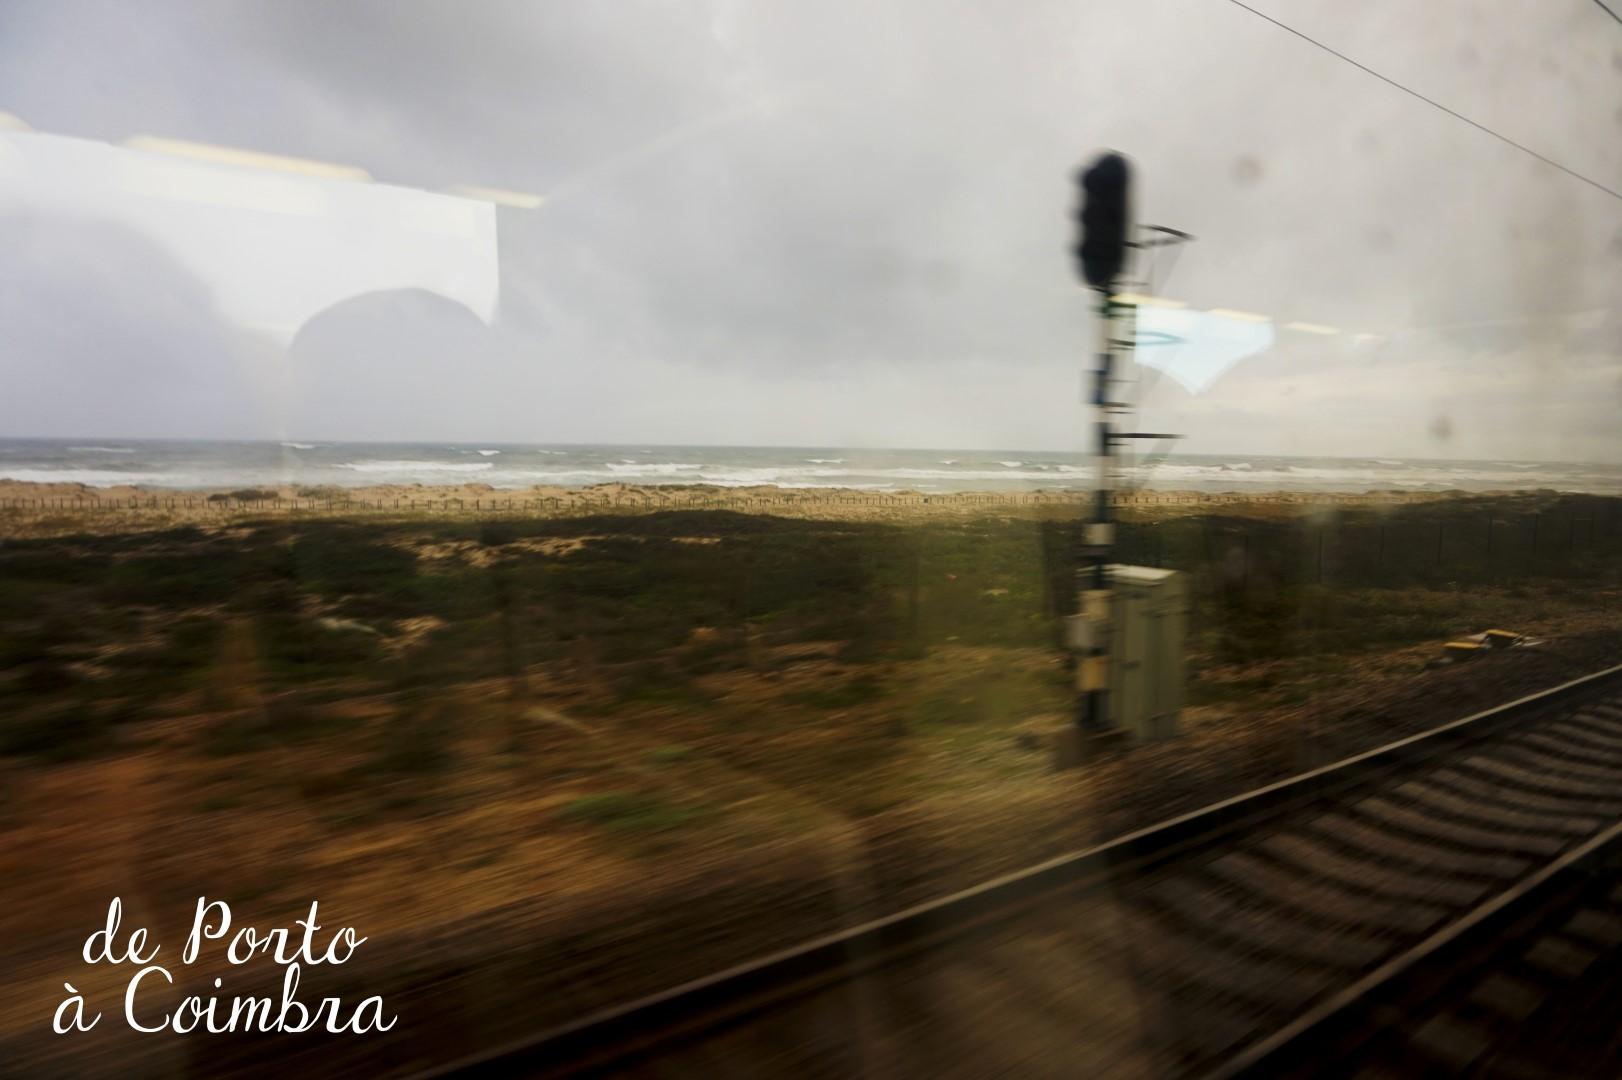 Rail trip au Portugal - De Porto à Coimbra